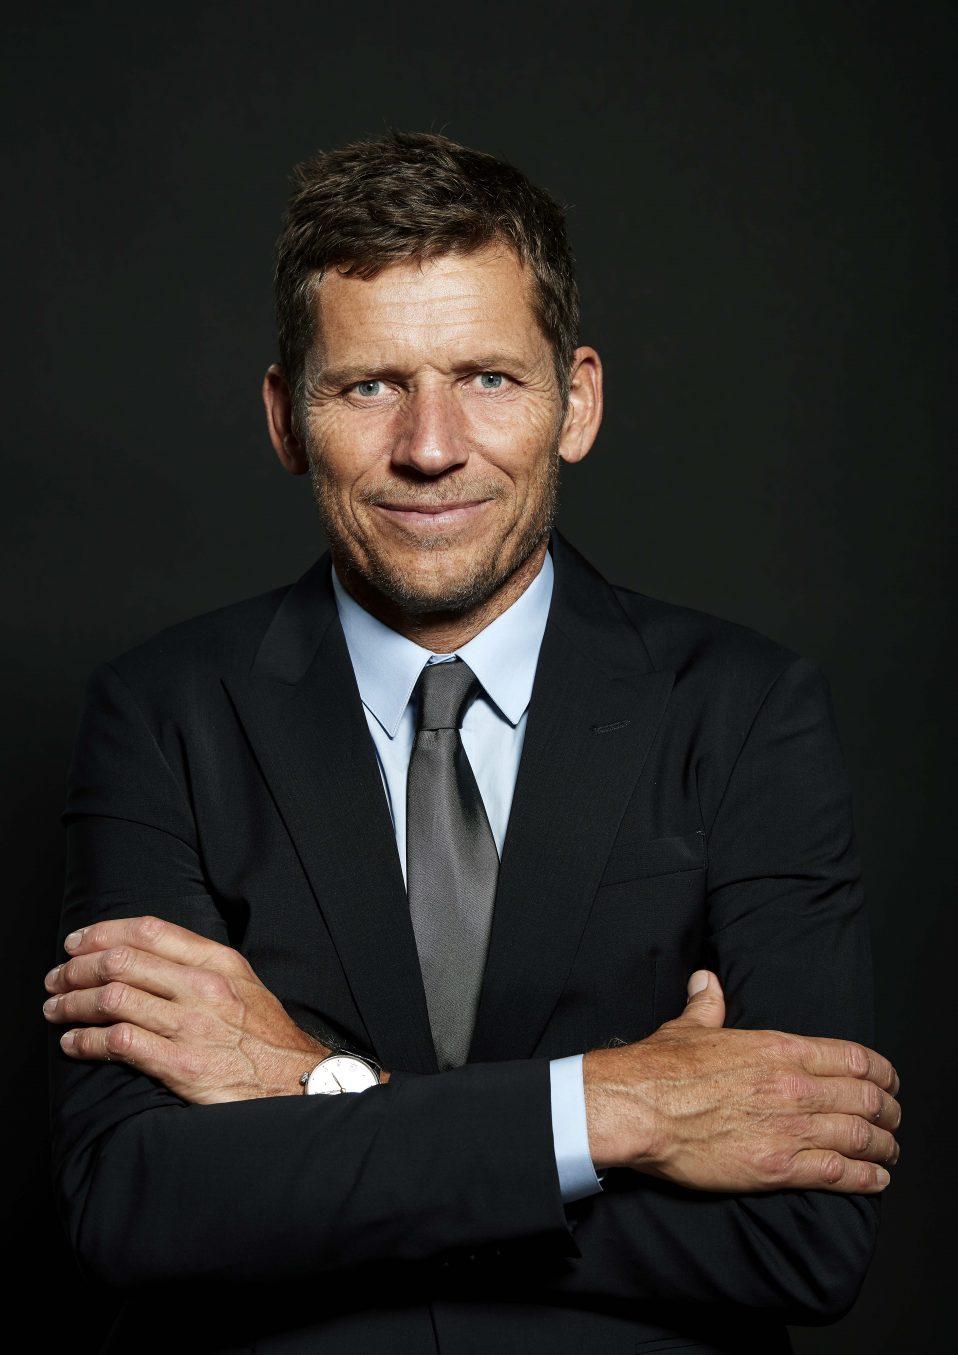 Claus Wiegand Larsen